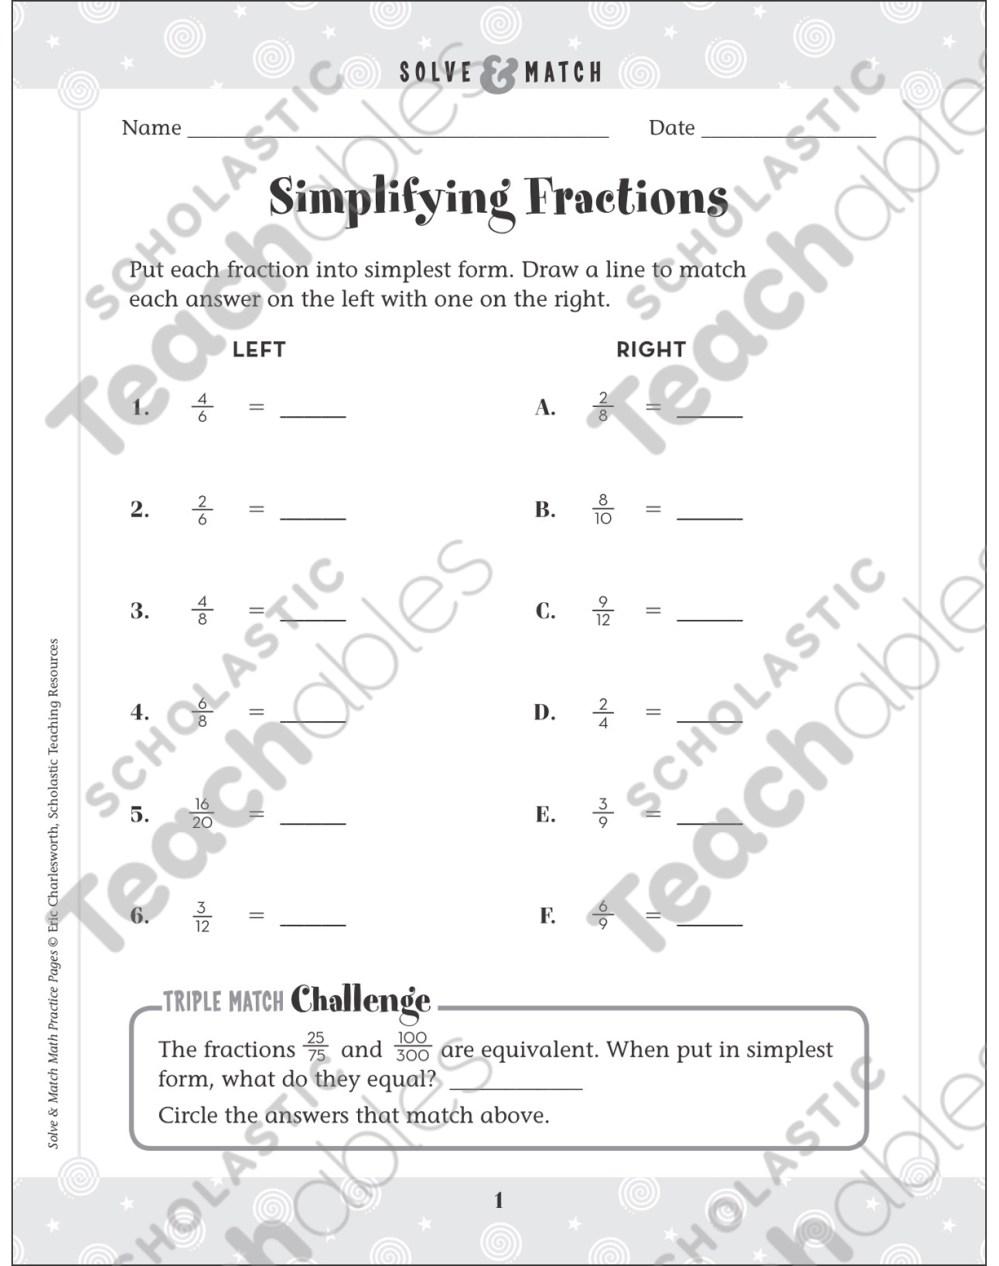 medium resolution of Simplifying Fractions: Solve \u0026 Match Math   Printable Skills Sheets